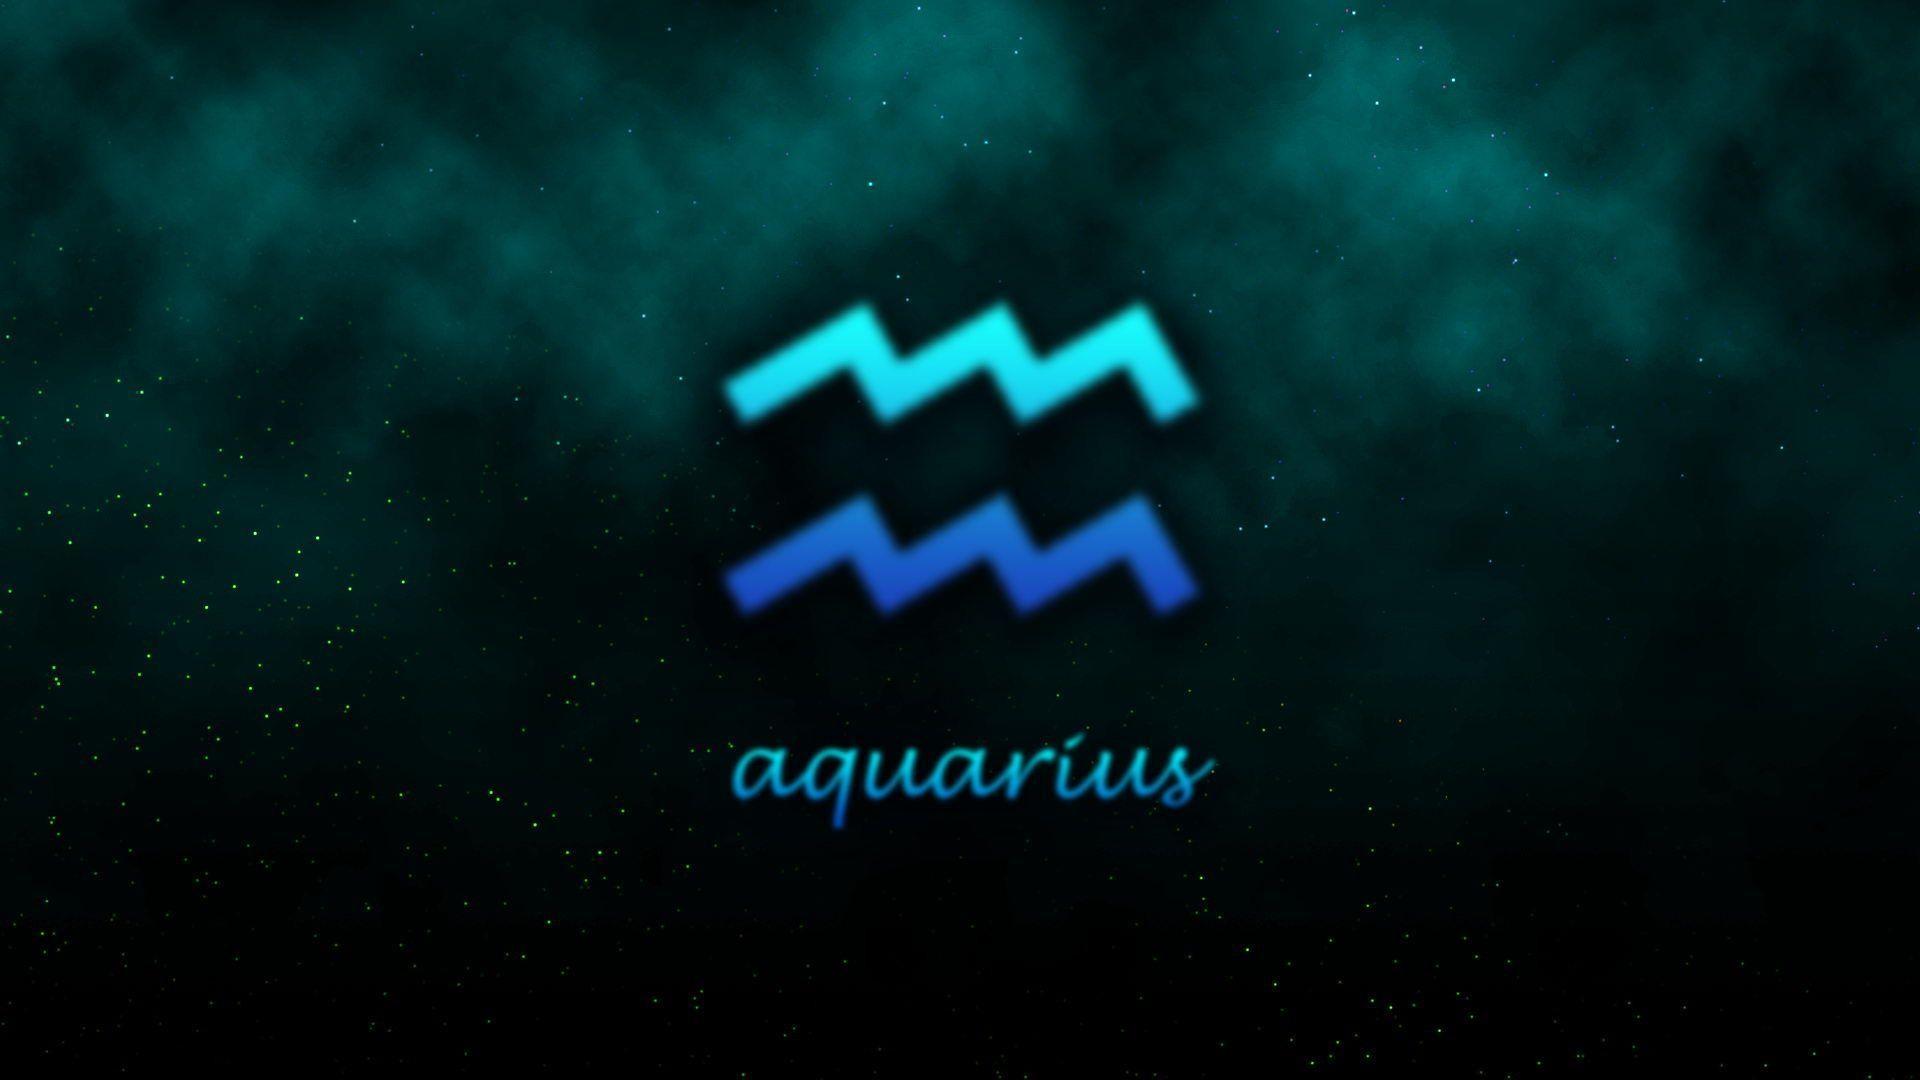 1920x1080 Images For Aquarius Wallpaper Mobile